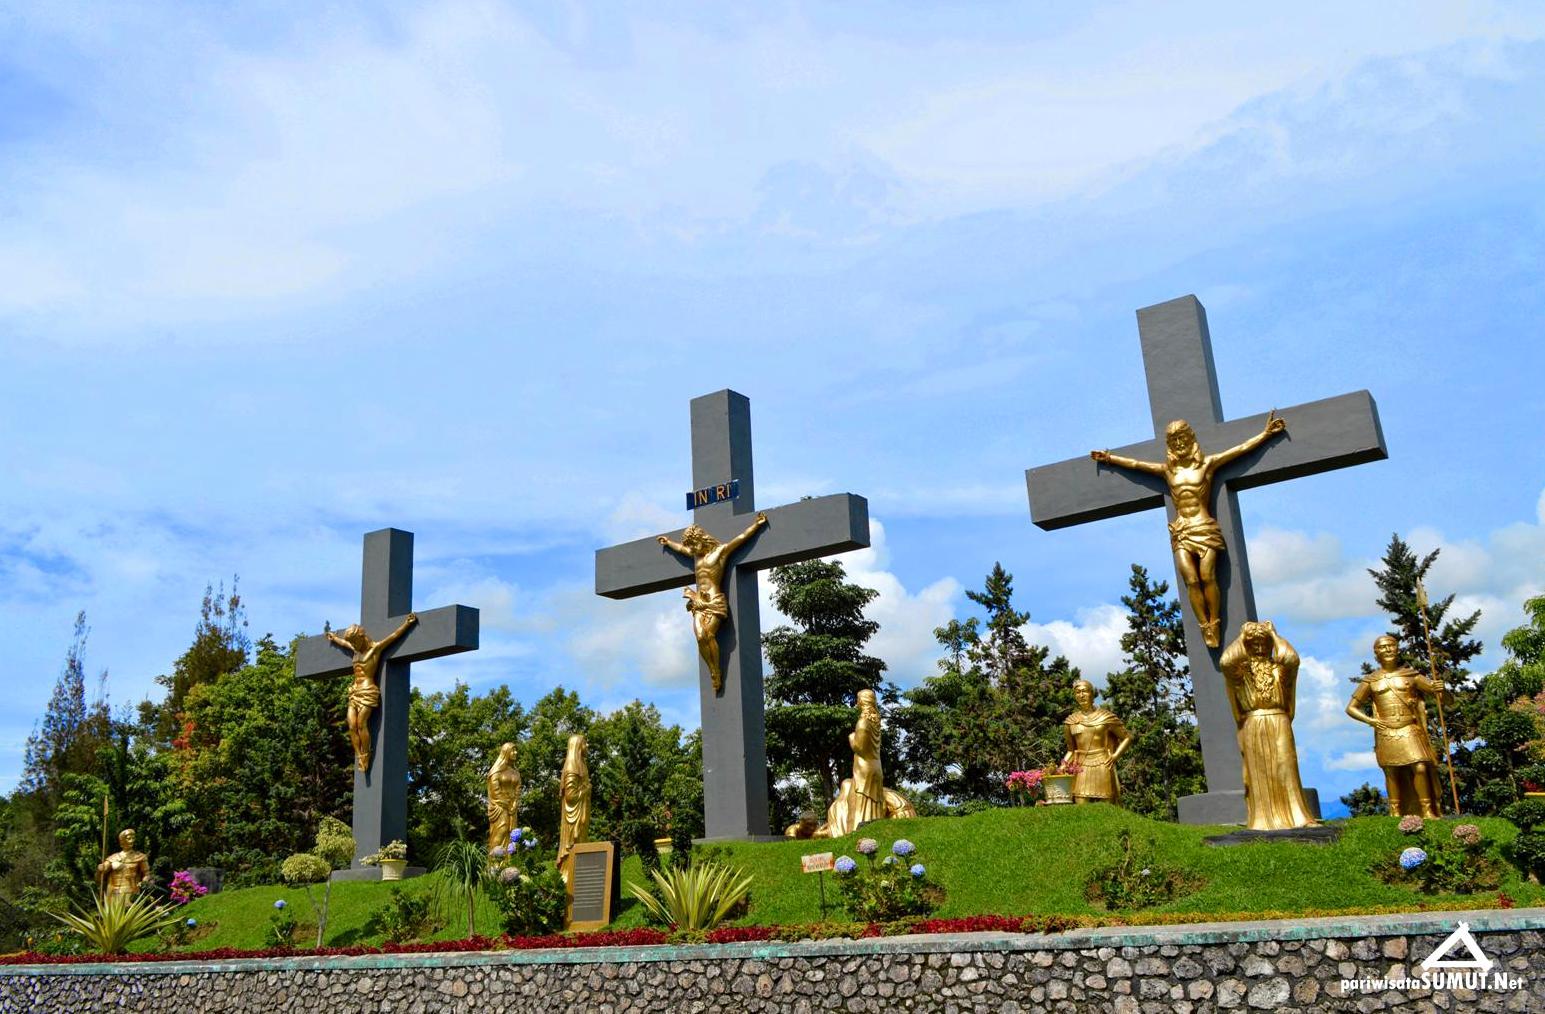 Image result for Taman Wisata Iman Sitinjo, Dairi